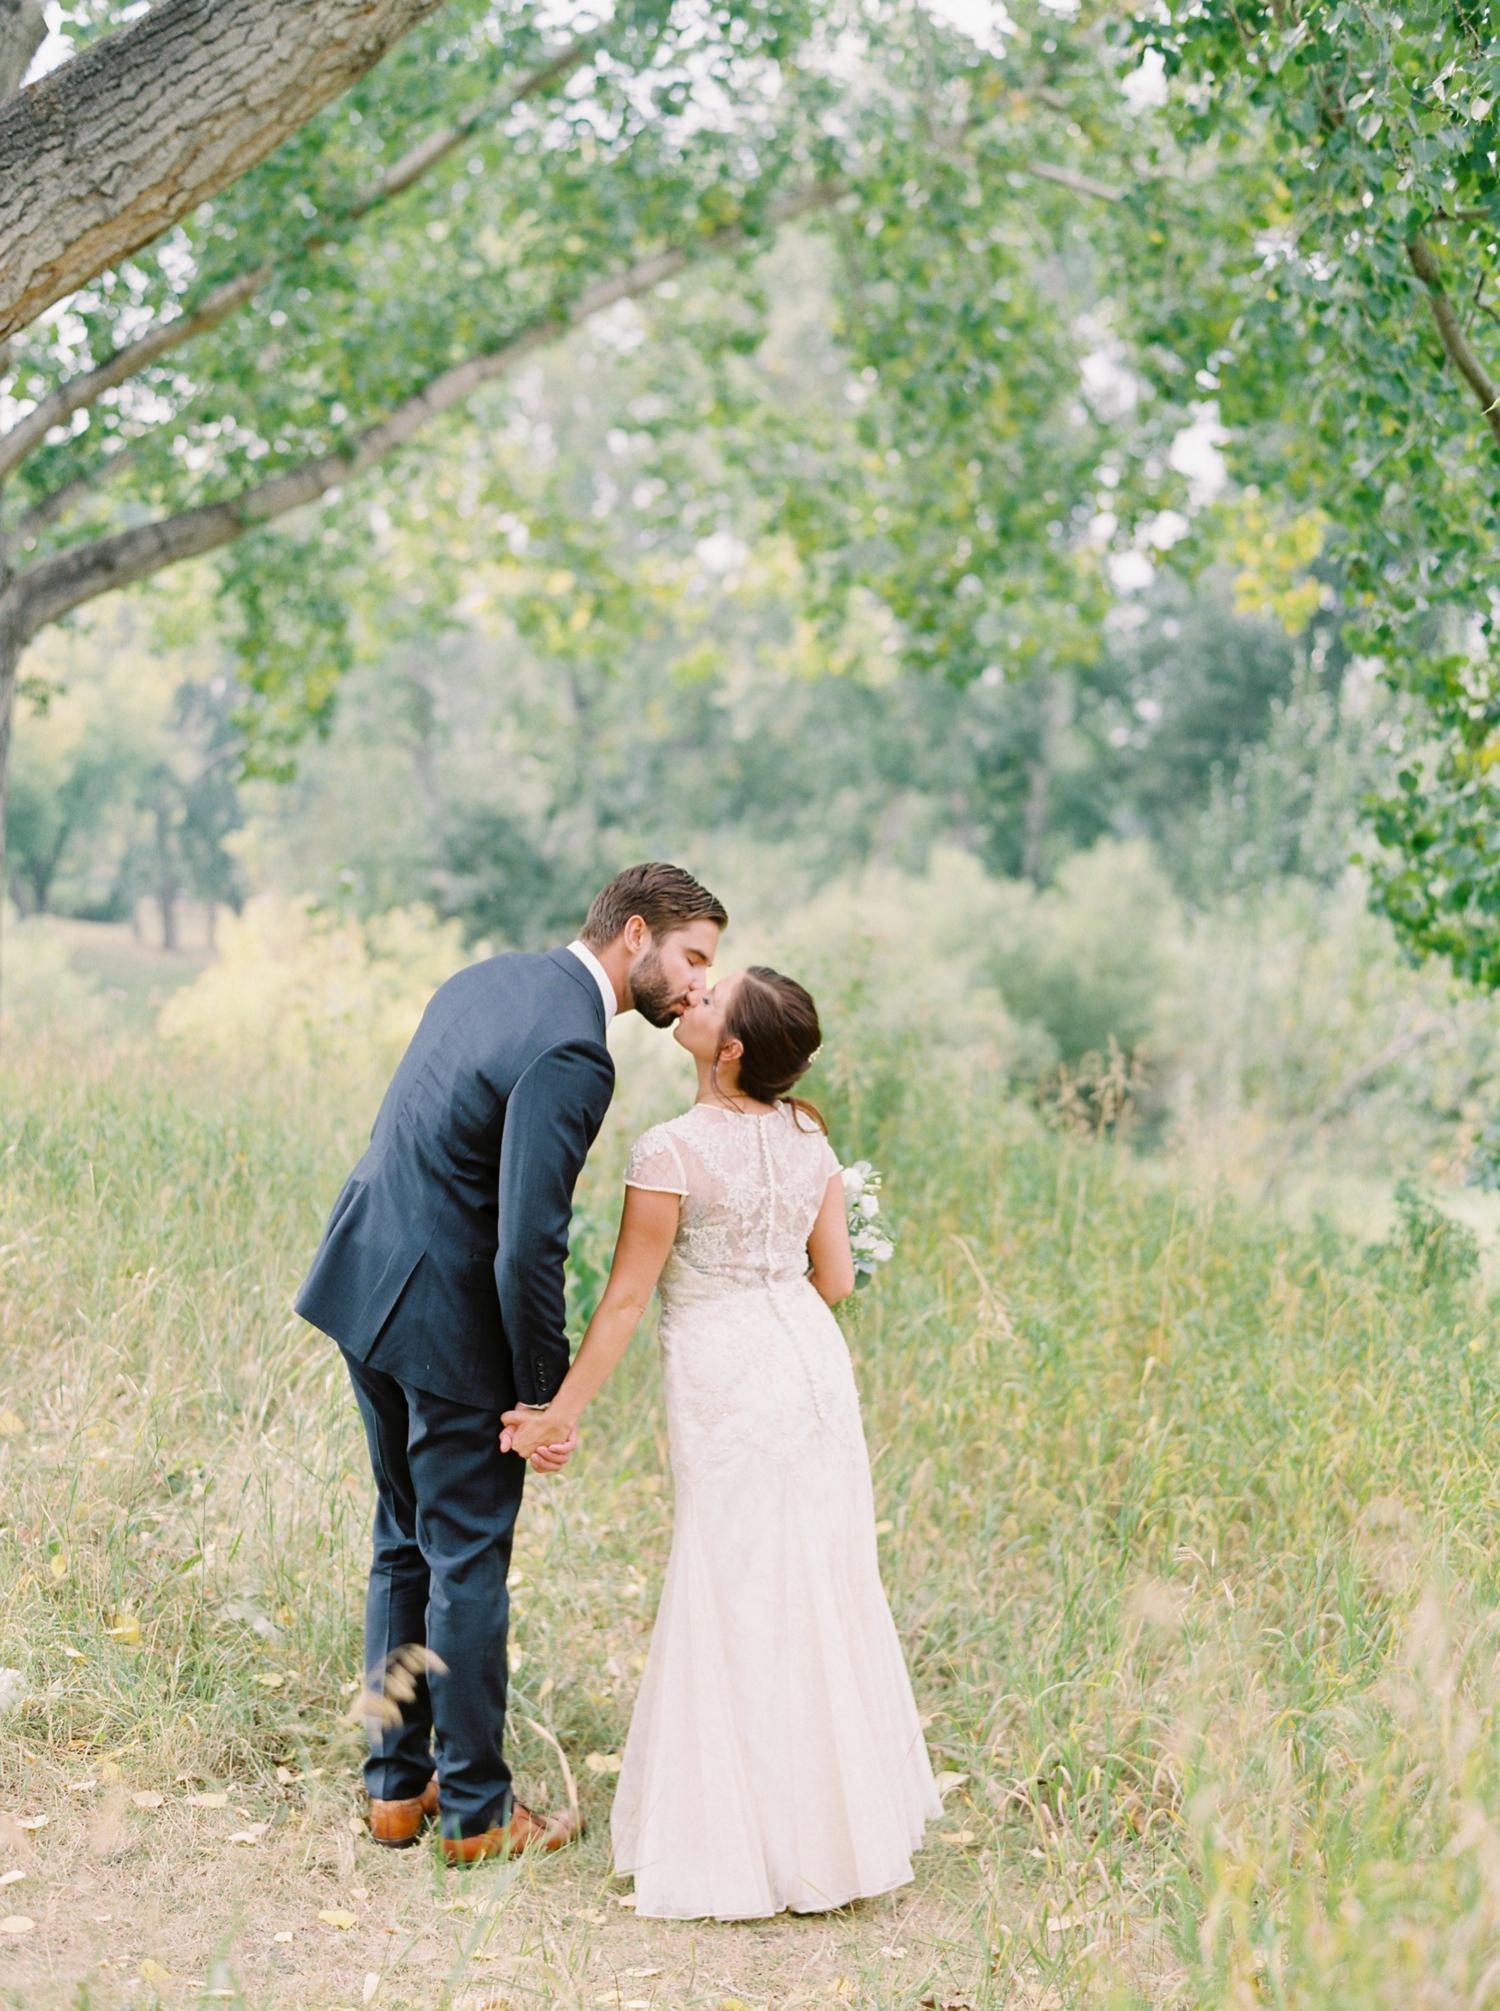 Calgary wedding photographers | fine art film | Justine Milton Photography | wedding inspiration | wedding dress | bride and groom portraits